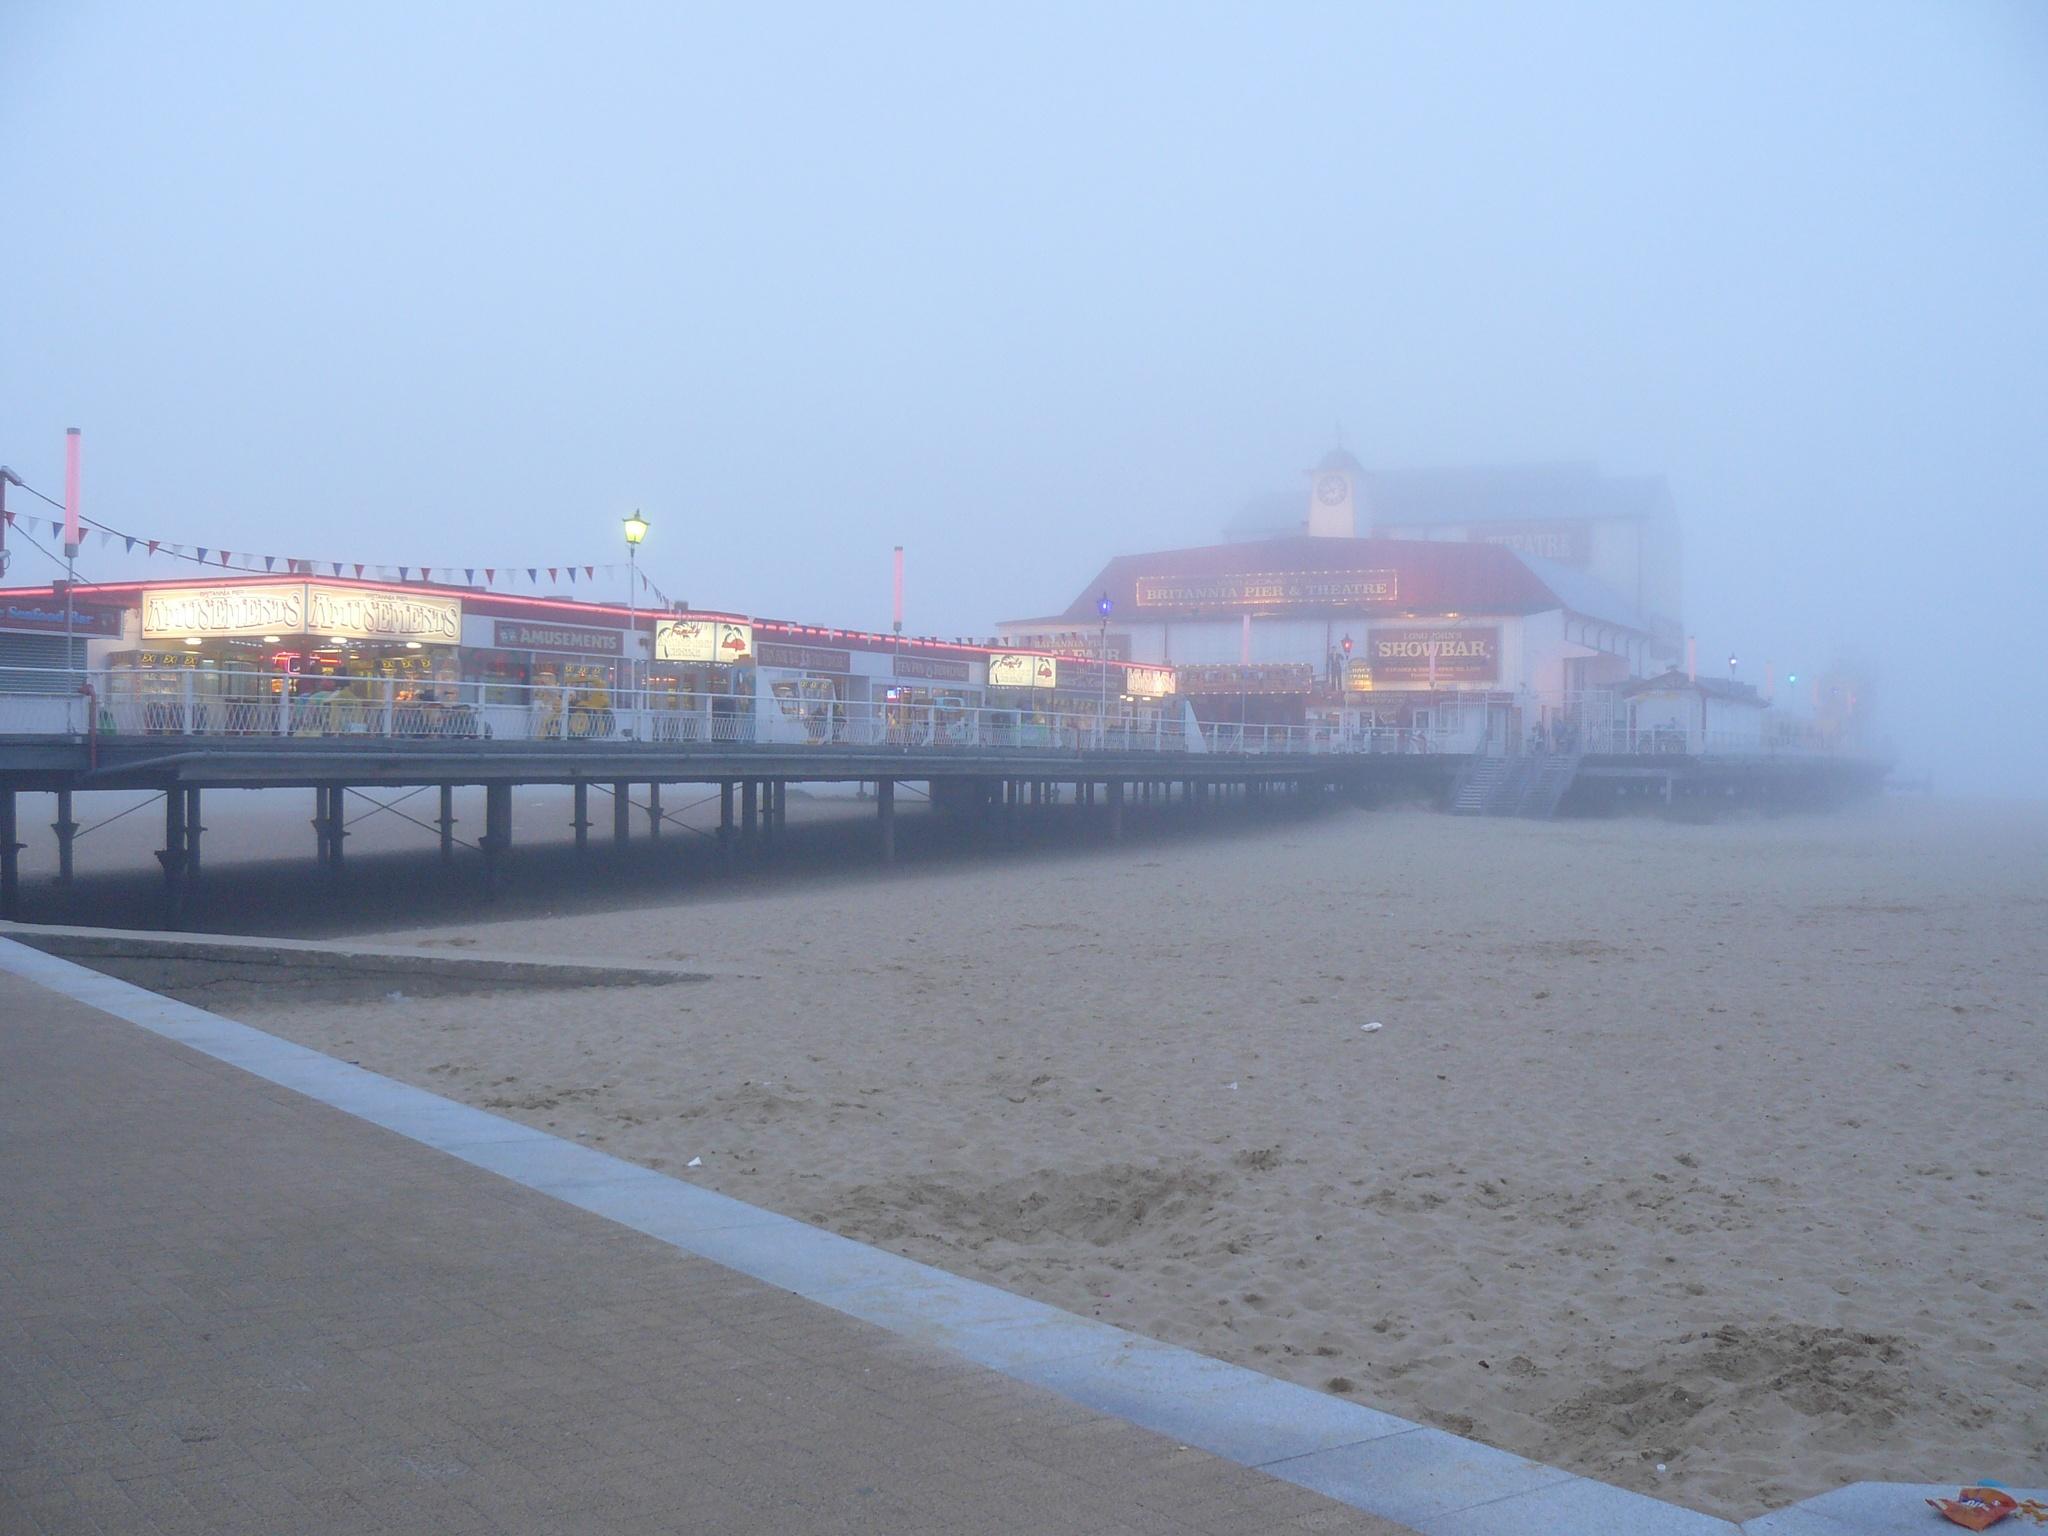 Pier mist by AJ Yakstrangler Andy Jamieson